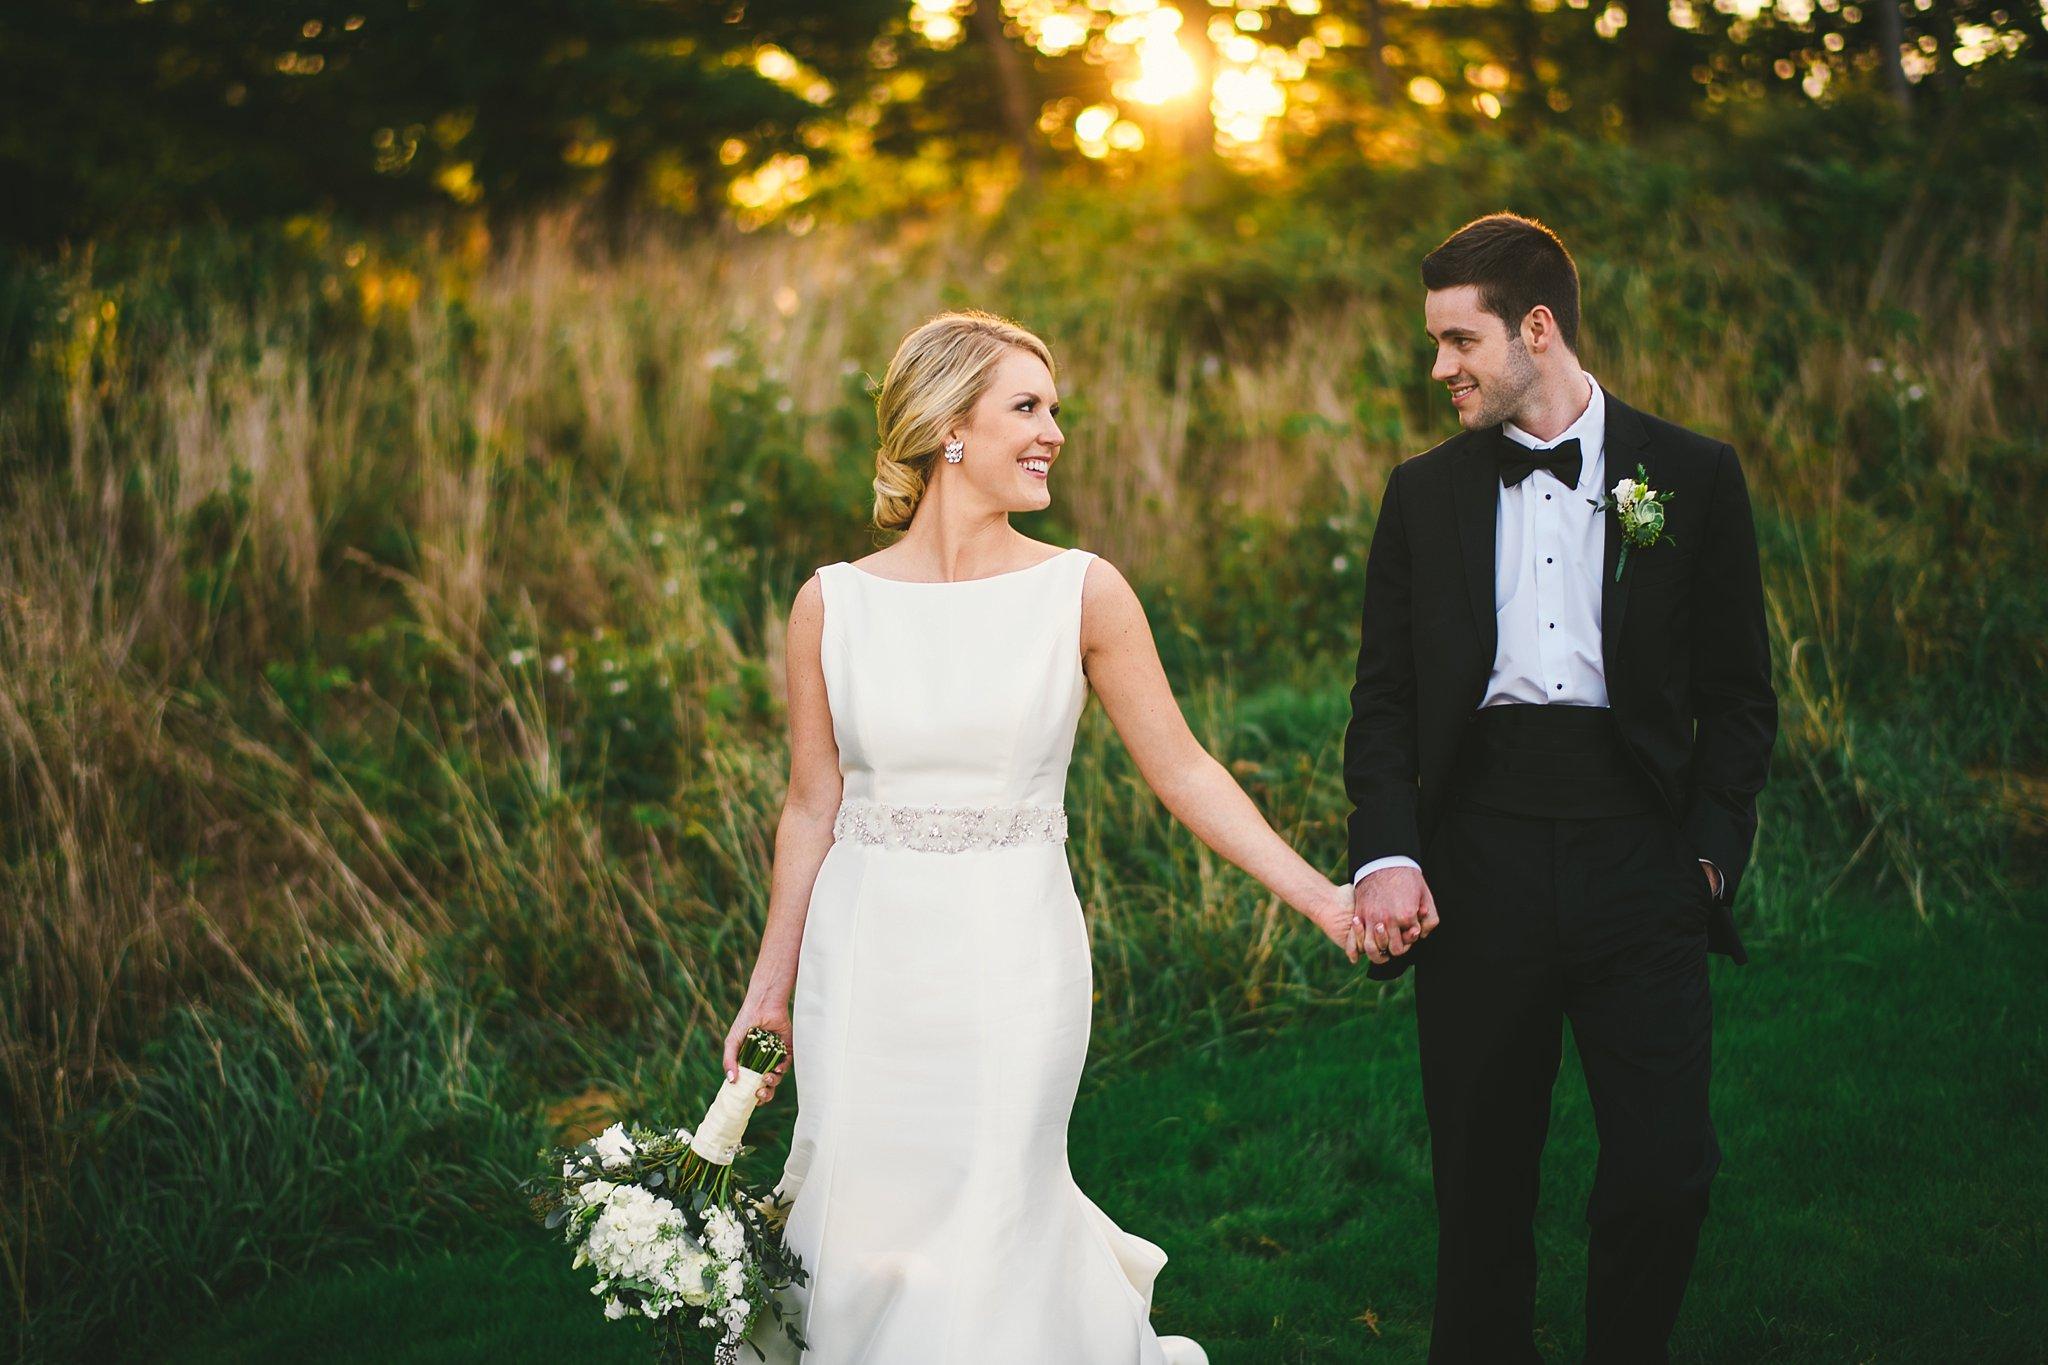 WHITBY CASTLE WEDDING -